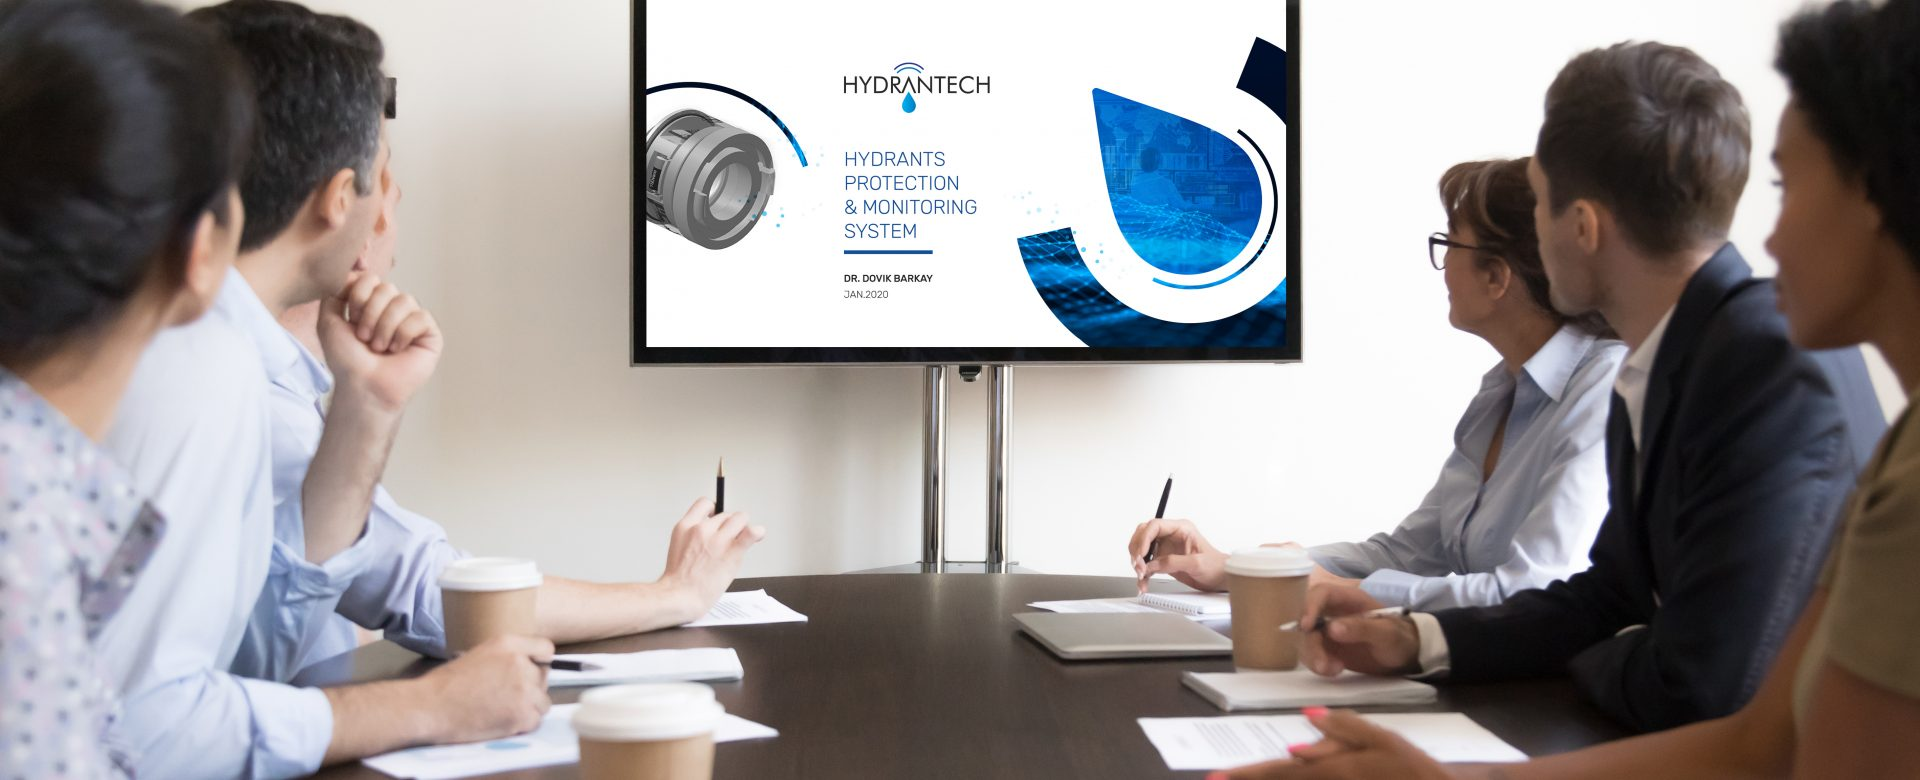 presentation Hydrantech